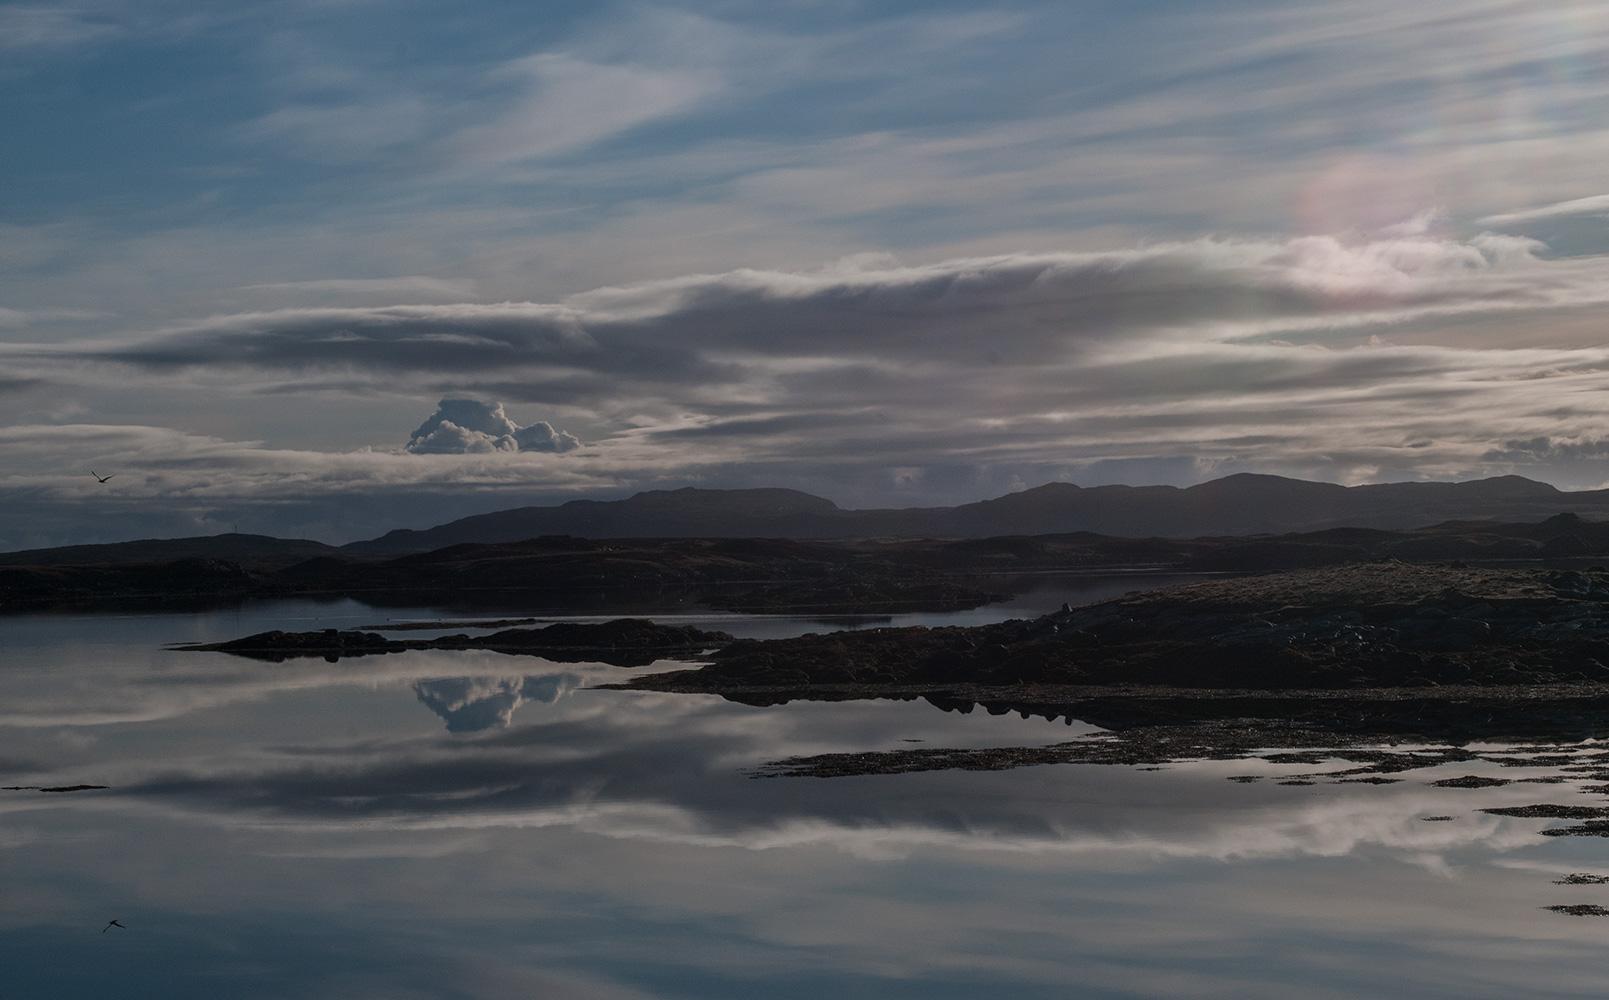 Uist, Outer Hebrides